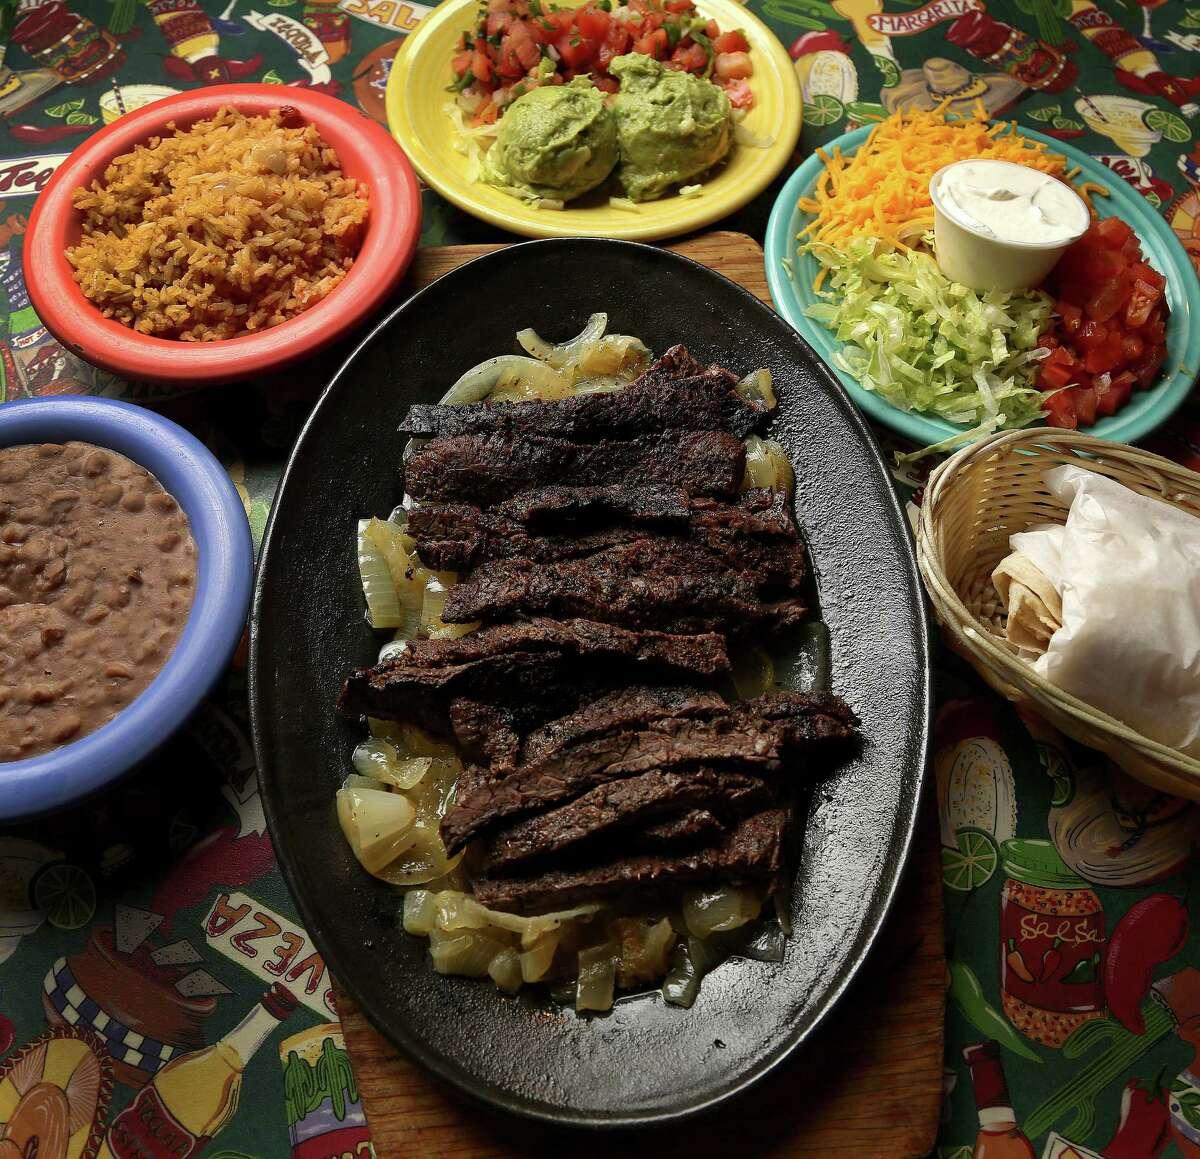 Beef fajitas at Lupita's Mexican Restaurant